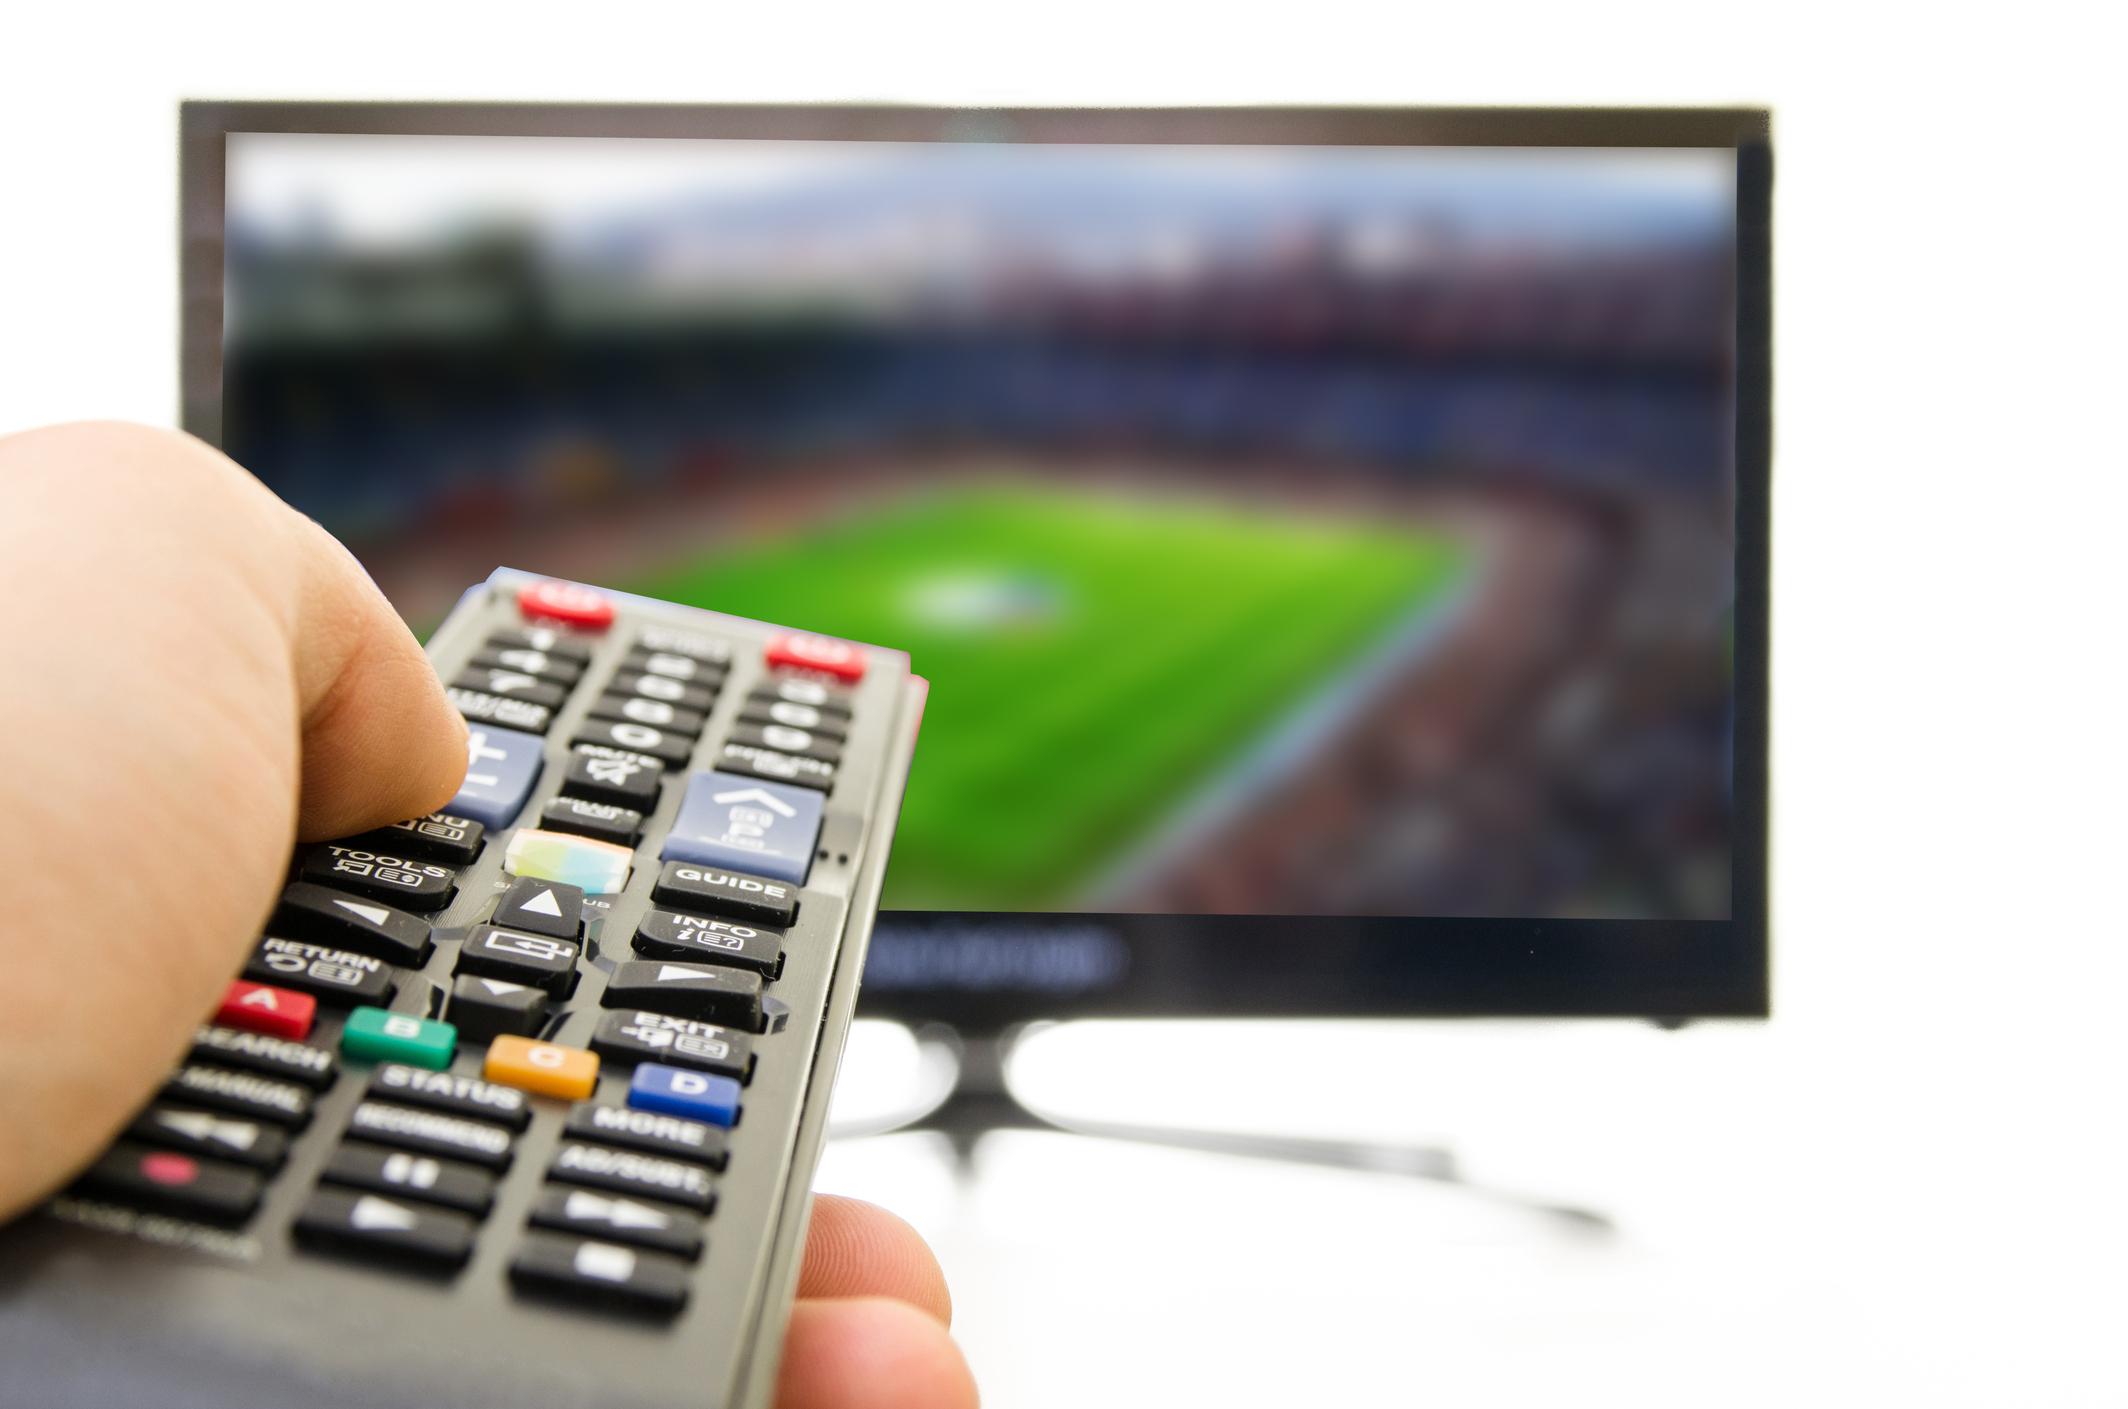 live TV - Will Netflix ever consider it?